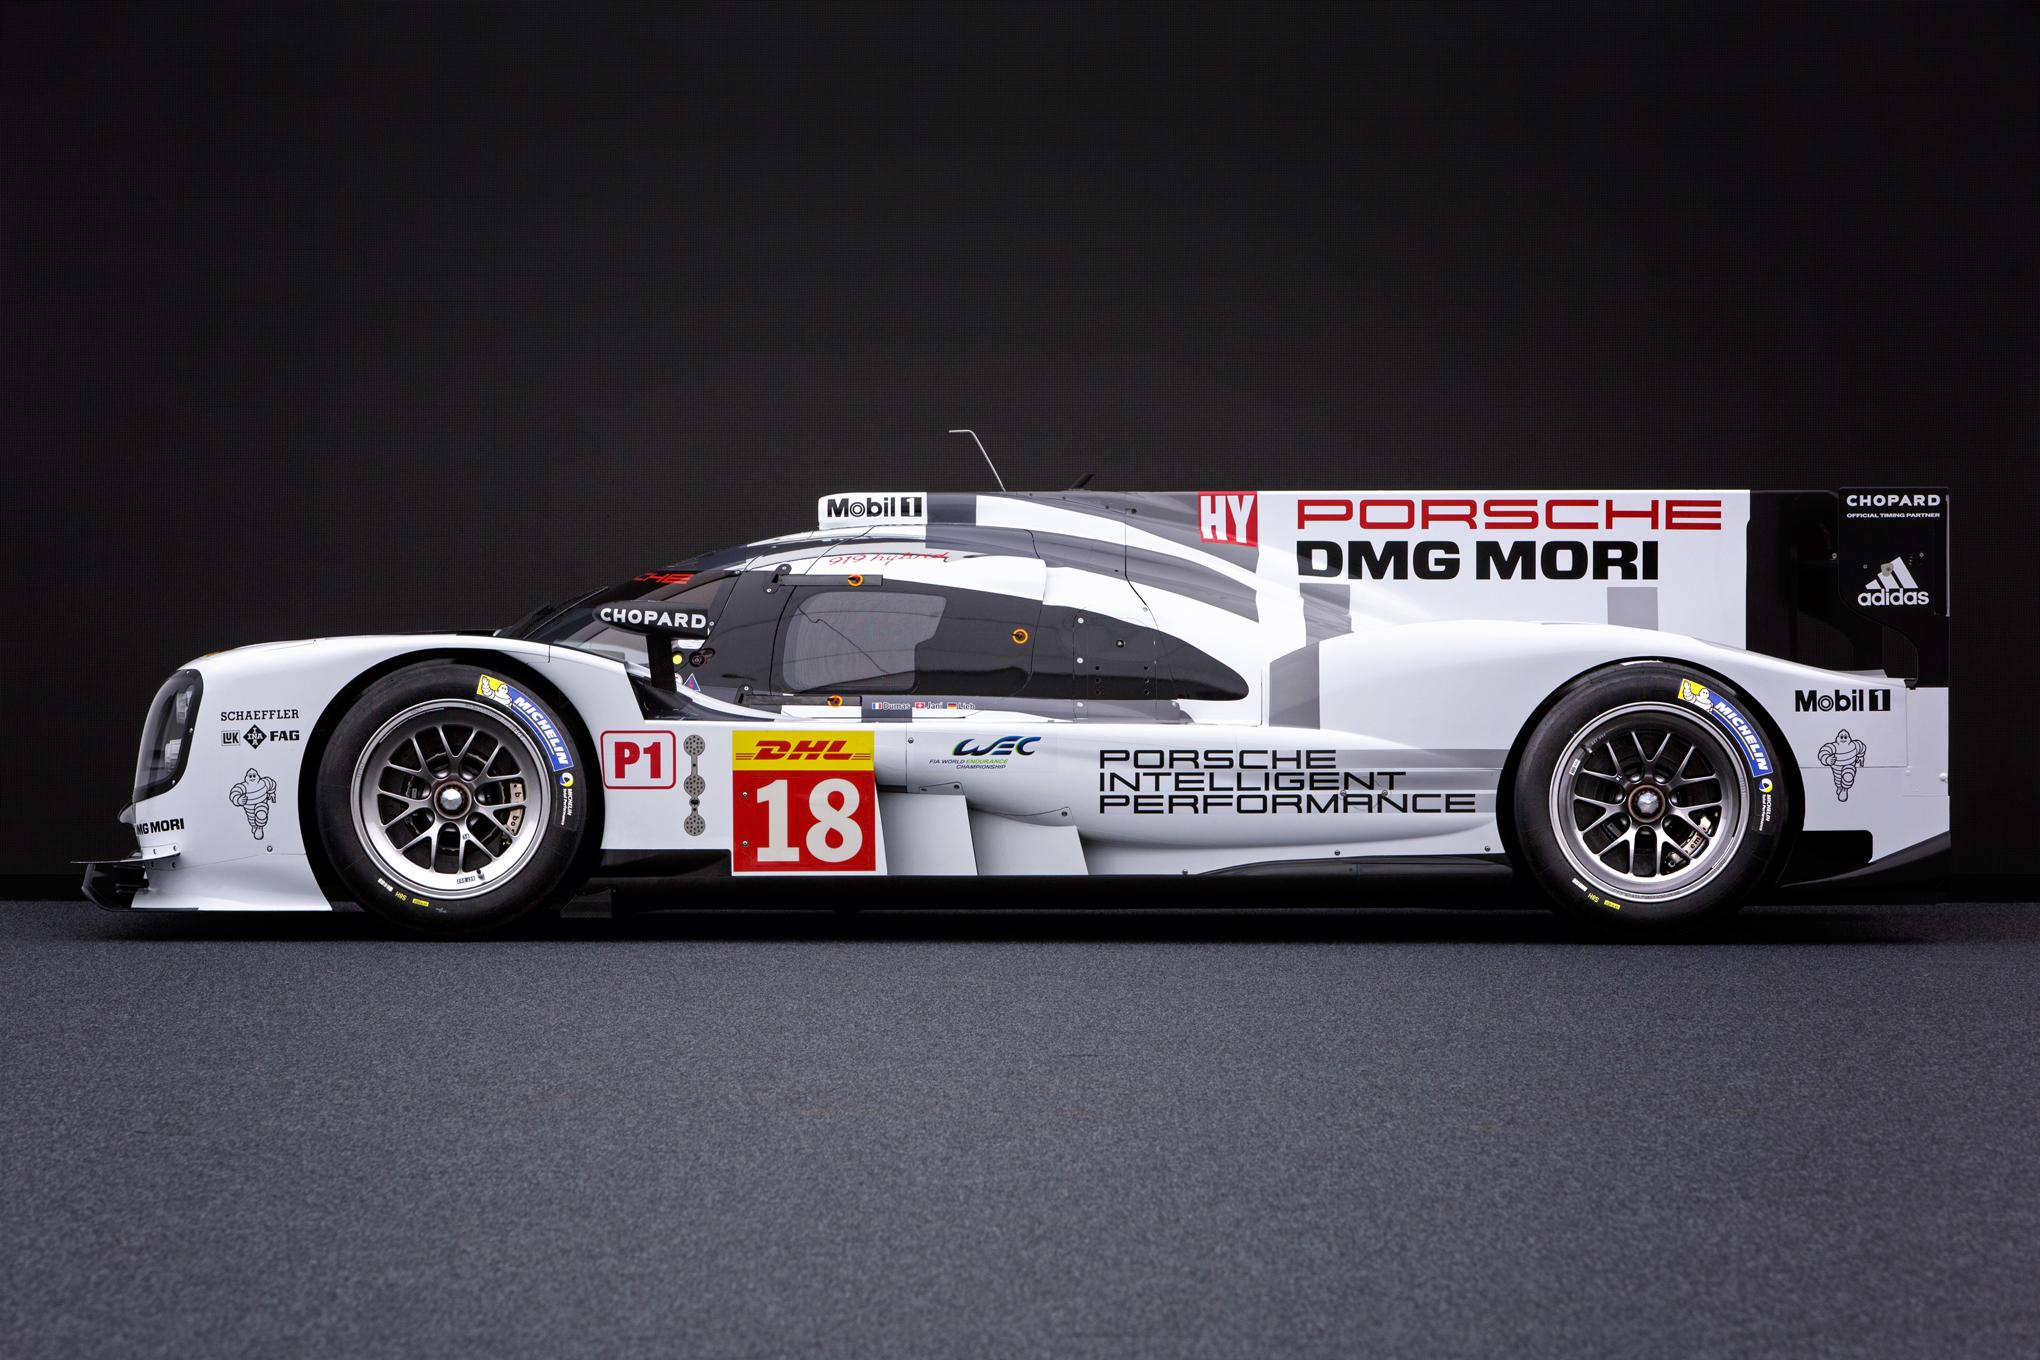 Image Of Porsche 919 Hybrid